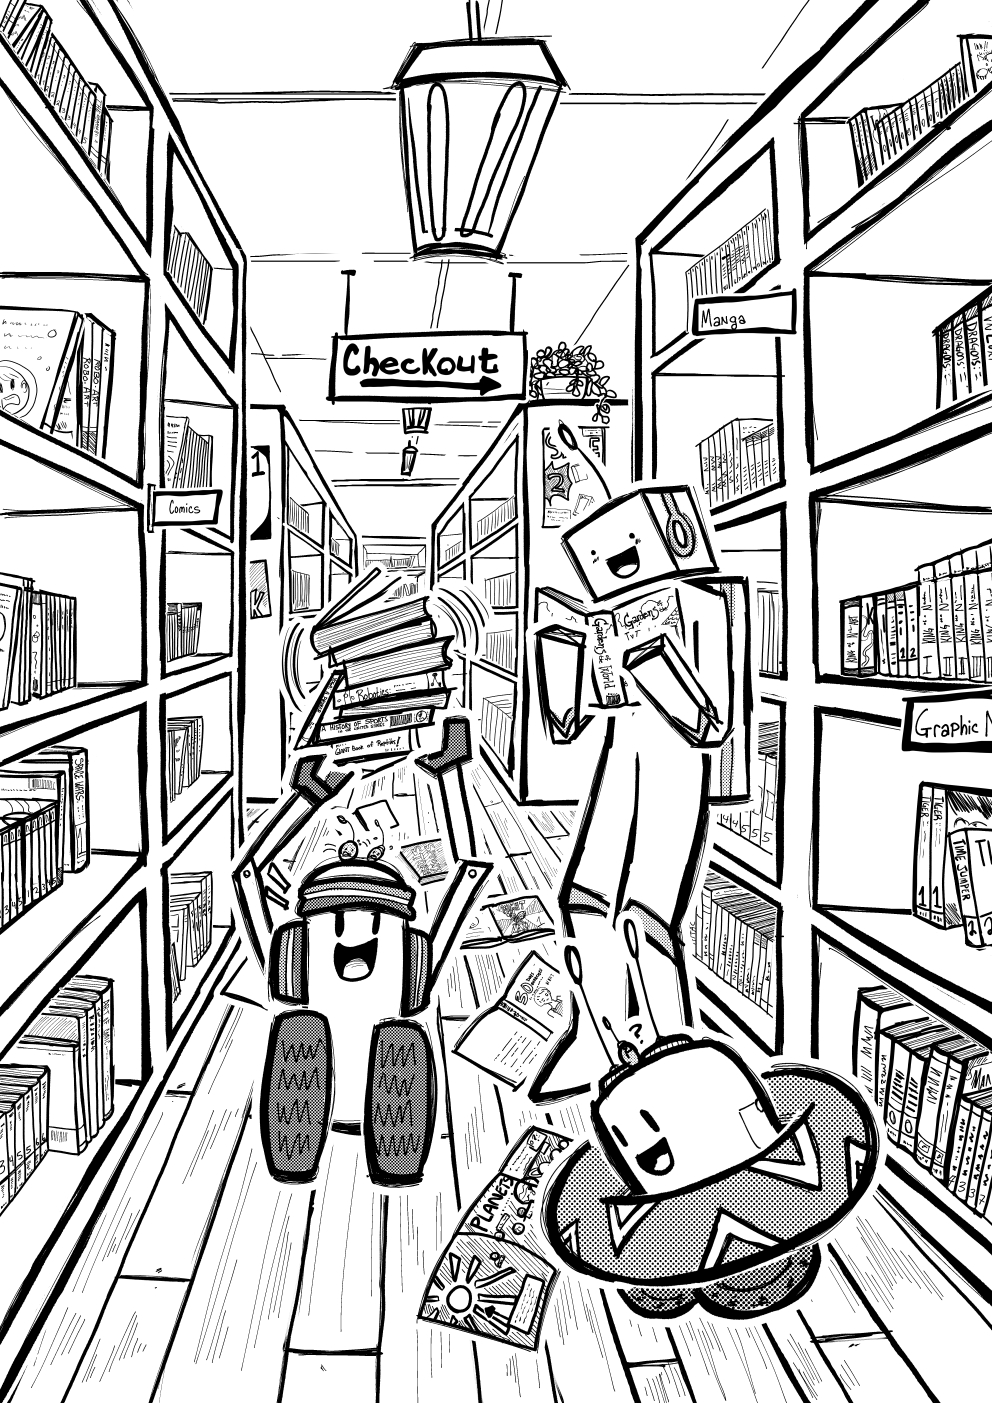 Art Break- In the Bookstore (B/W version)